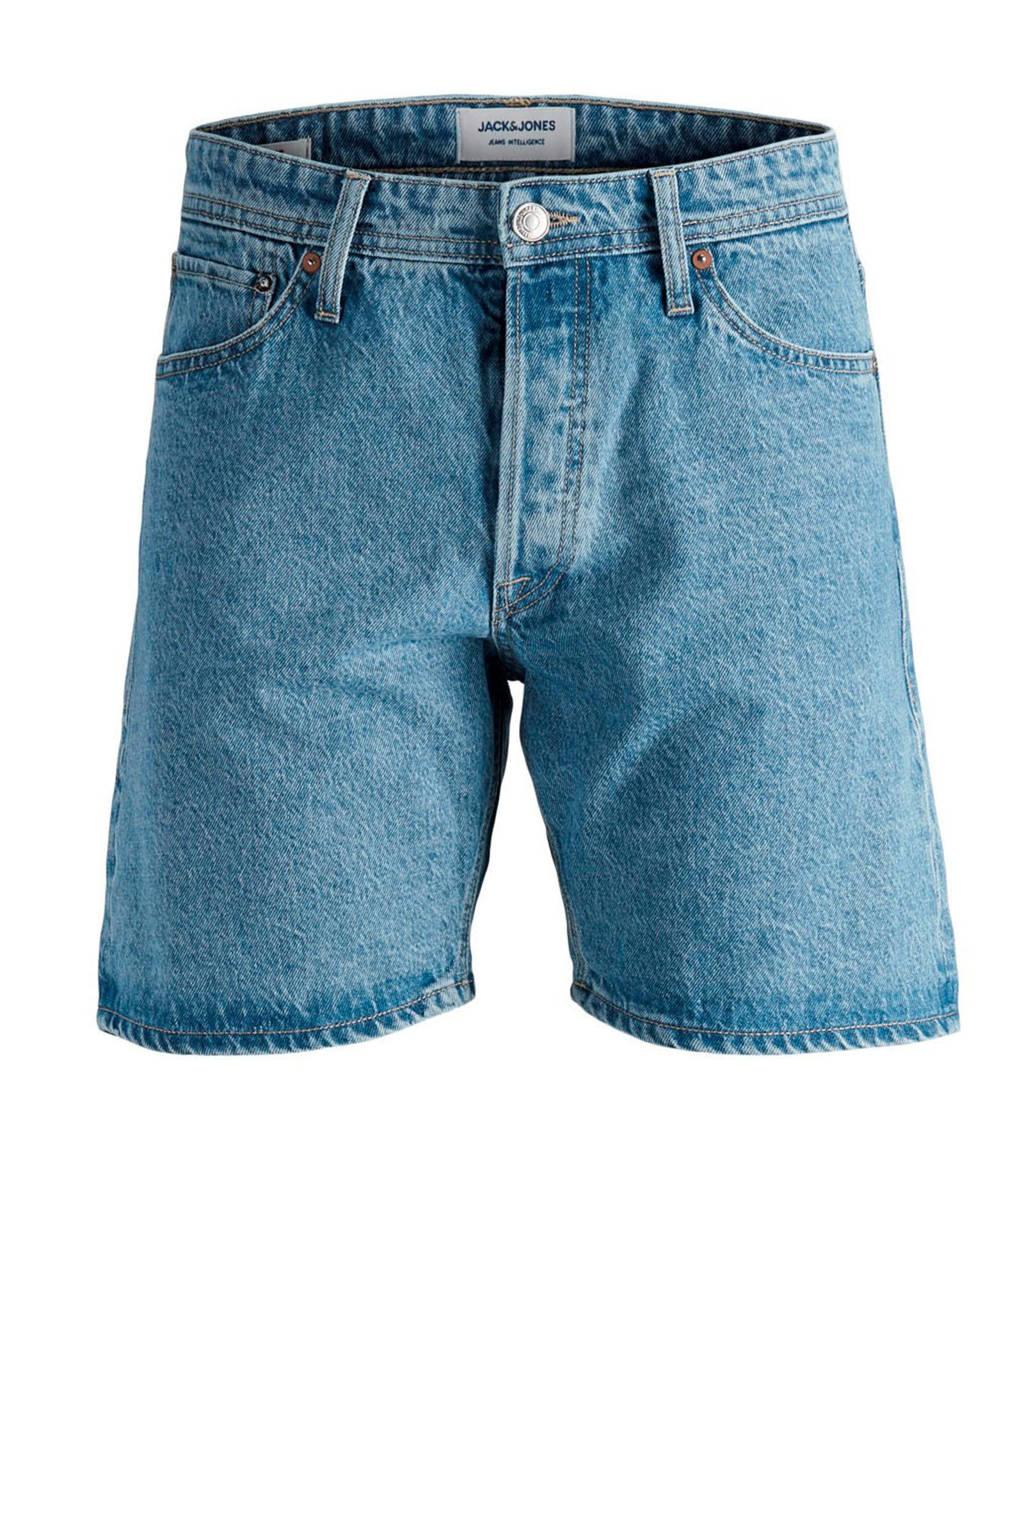 JACK & JONES JEANS INTELLIGENCE regular fit jeans short Chris blue denim, Blue denim